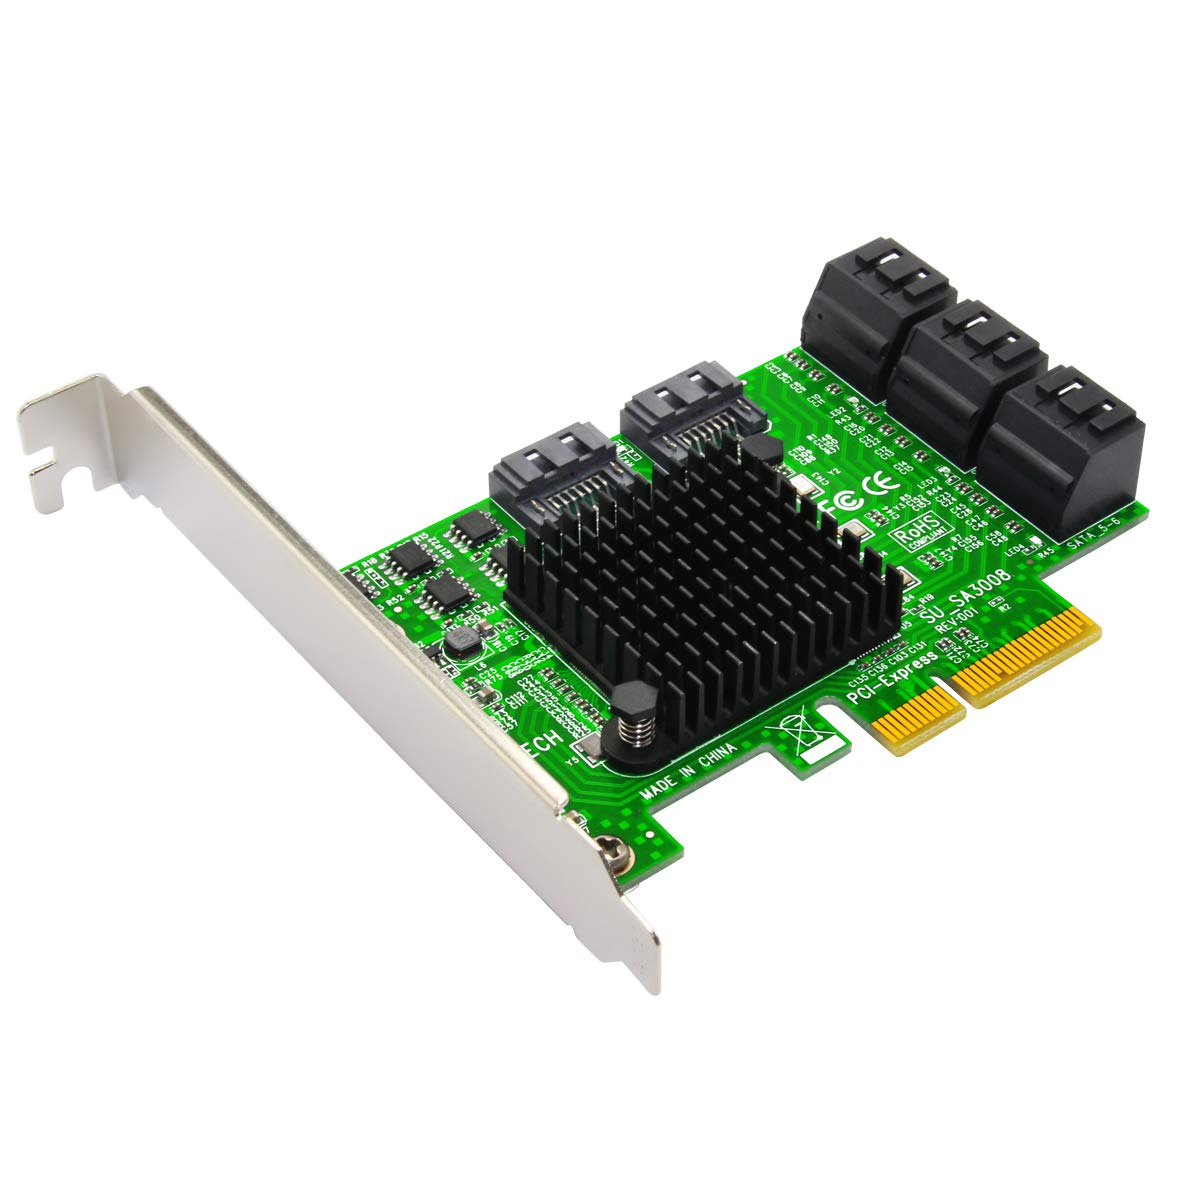 Expansion Card,Ubit Riser Card,PCIe 2.0 X2 to SATA III 8-Port Adapter Card (ASM Chipset) for IPFS Mining,Pci-e to SATA3.0 Expansion Card,SATA3.0 Riser Card 6G IPFS Hard Disk Expansion Card